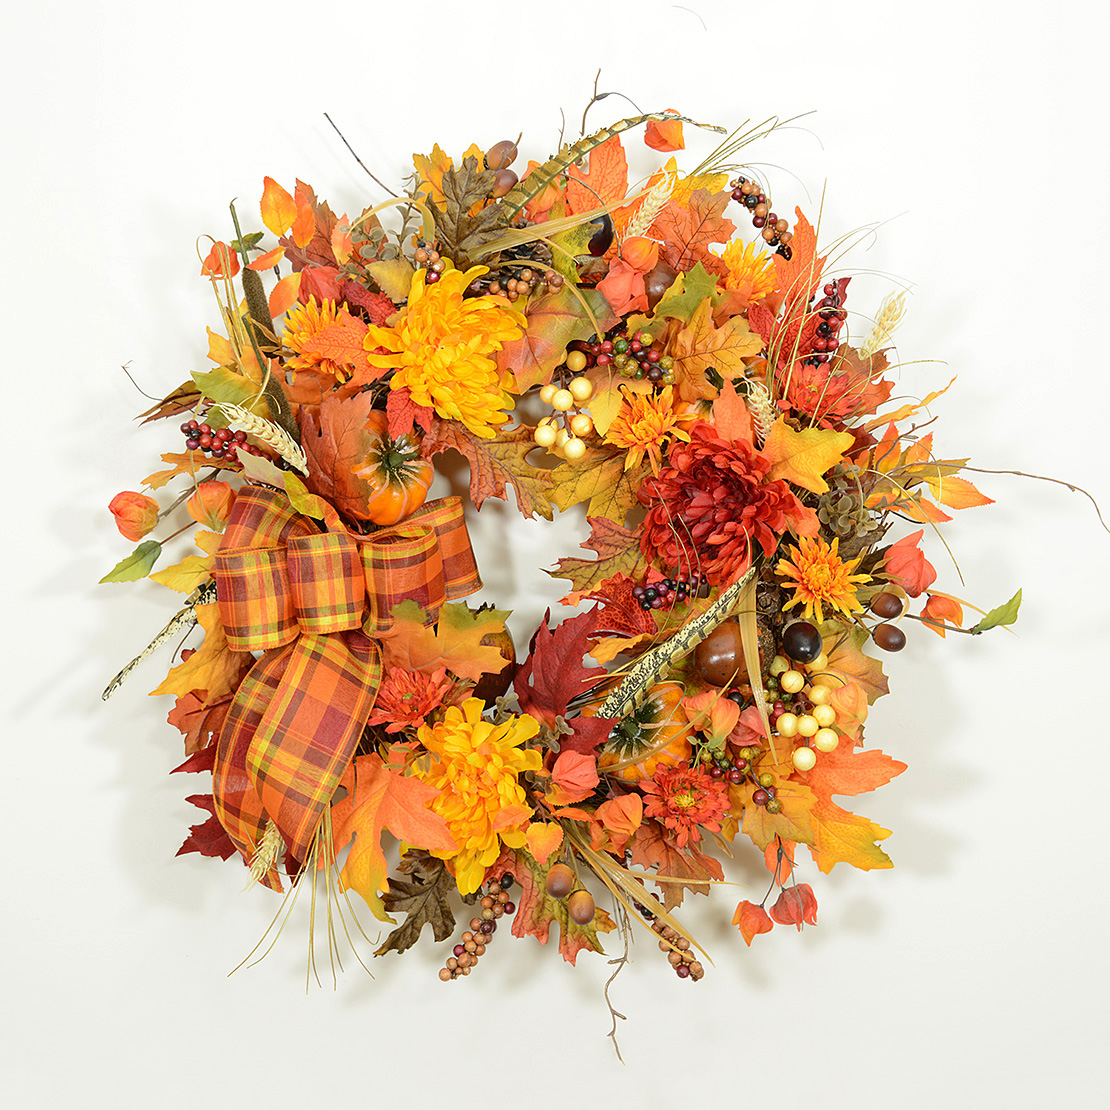 New England Autumn Harvest Wreath Wreaths Unlimited